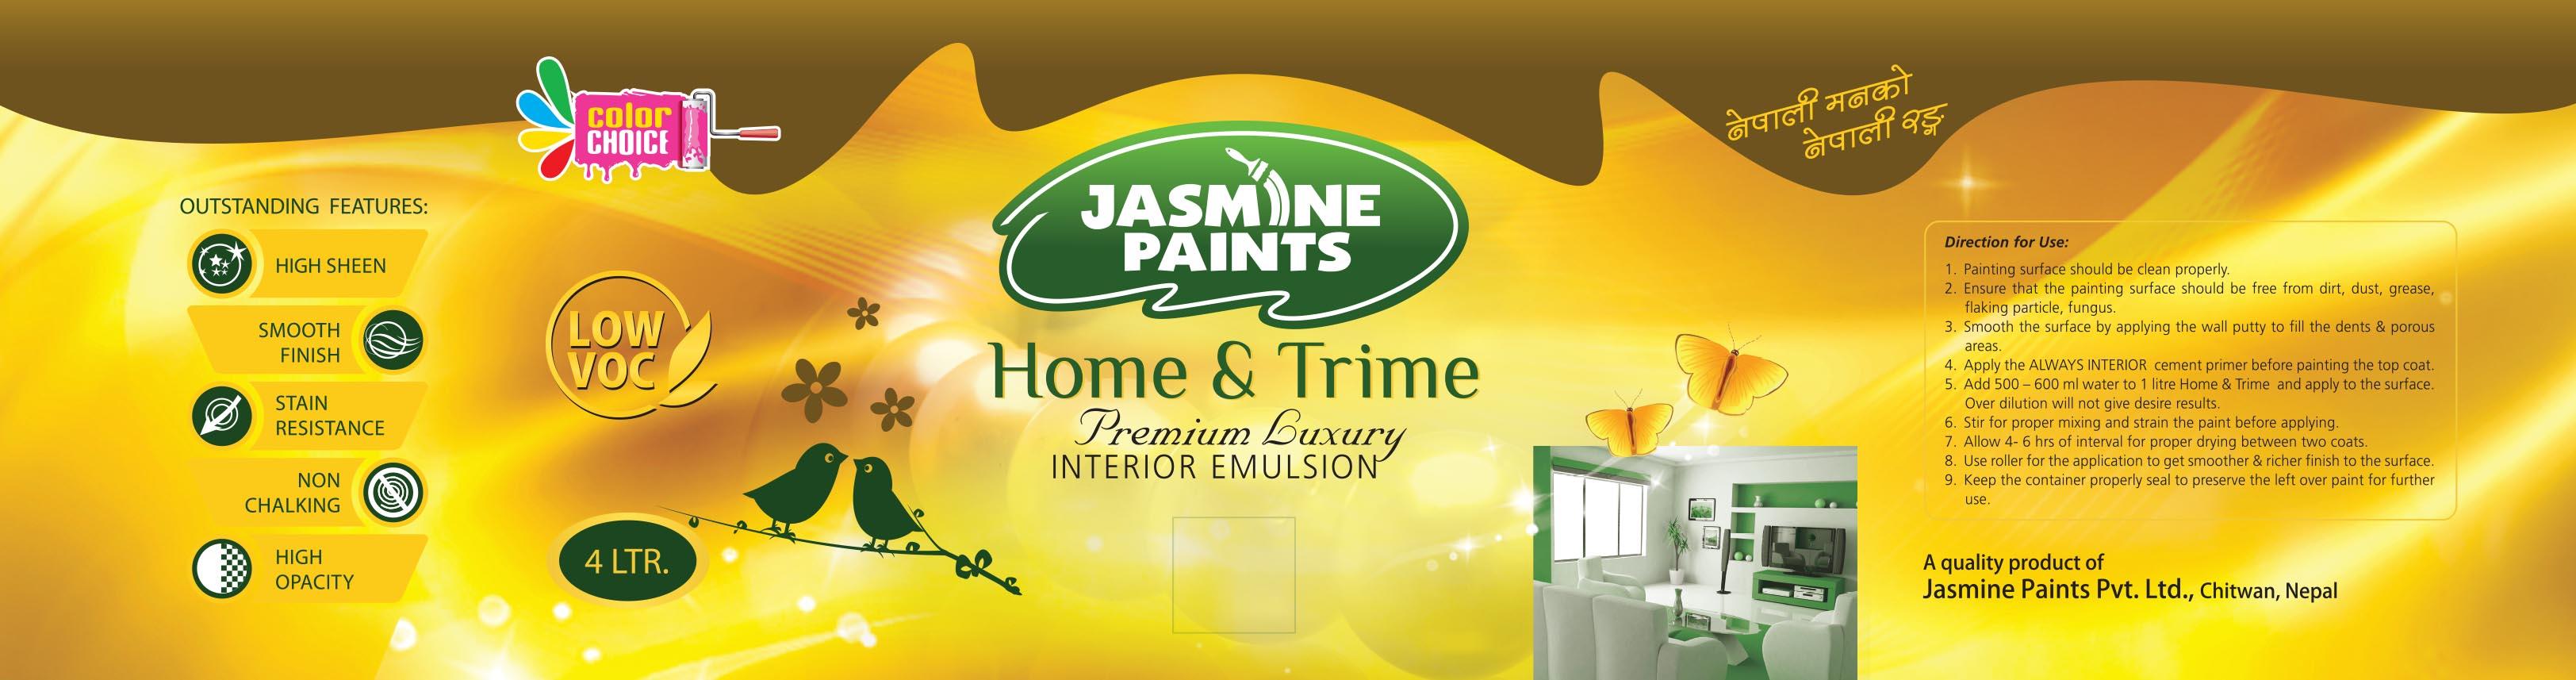 Home & Trime Final Design_4 Ltr_CTP copy